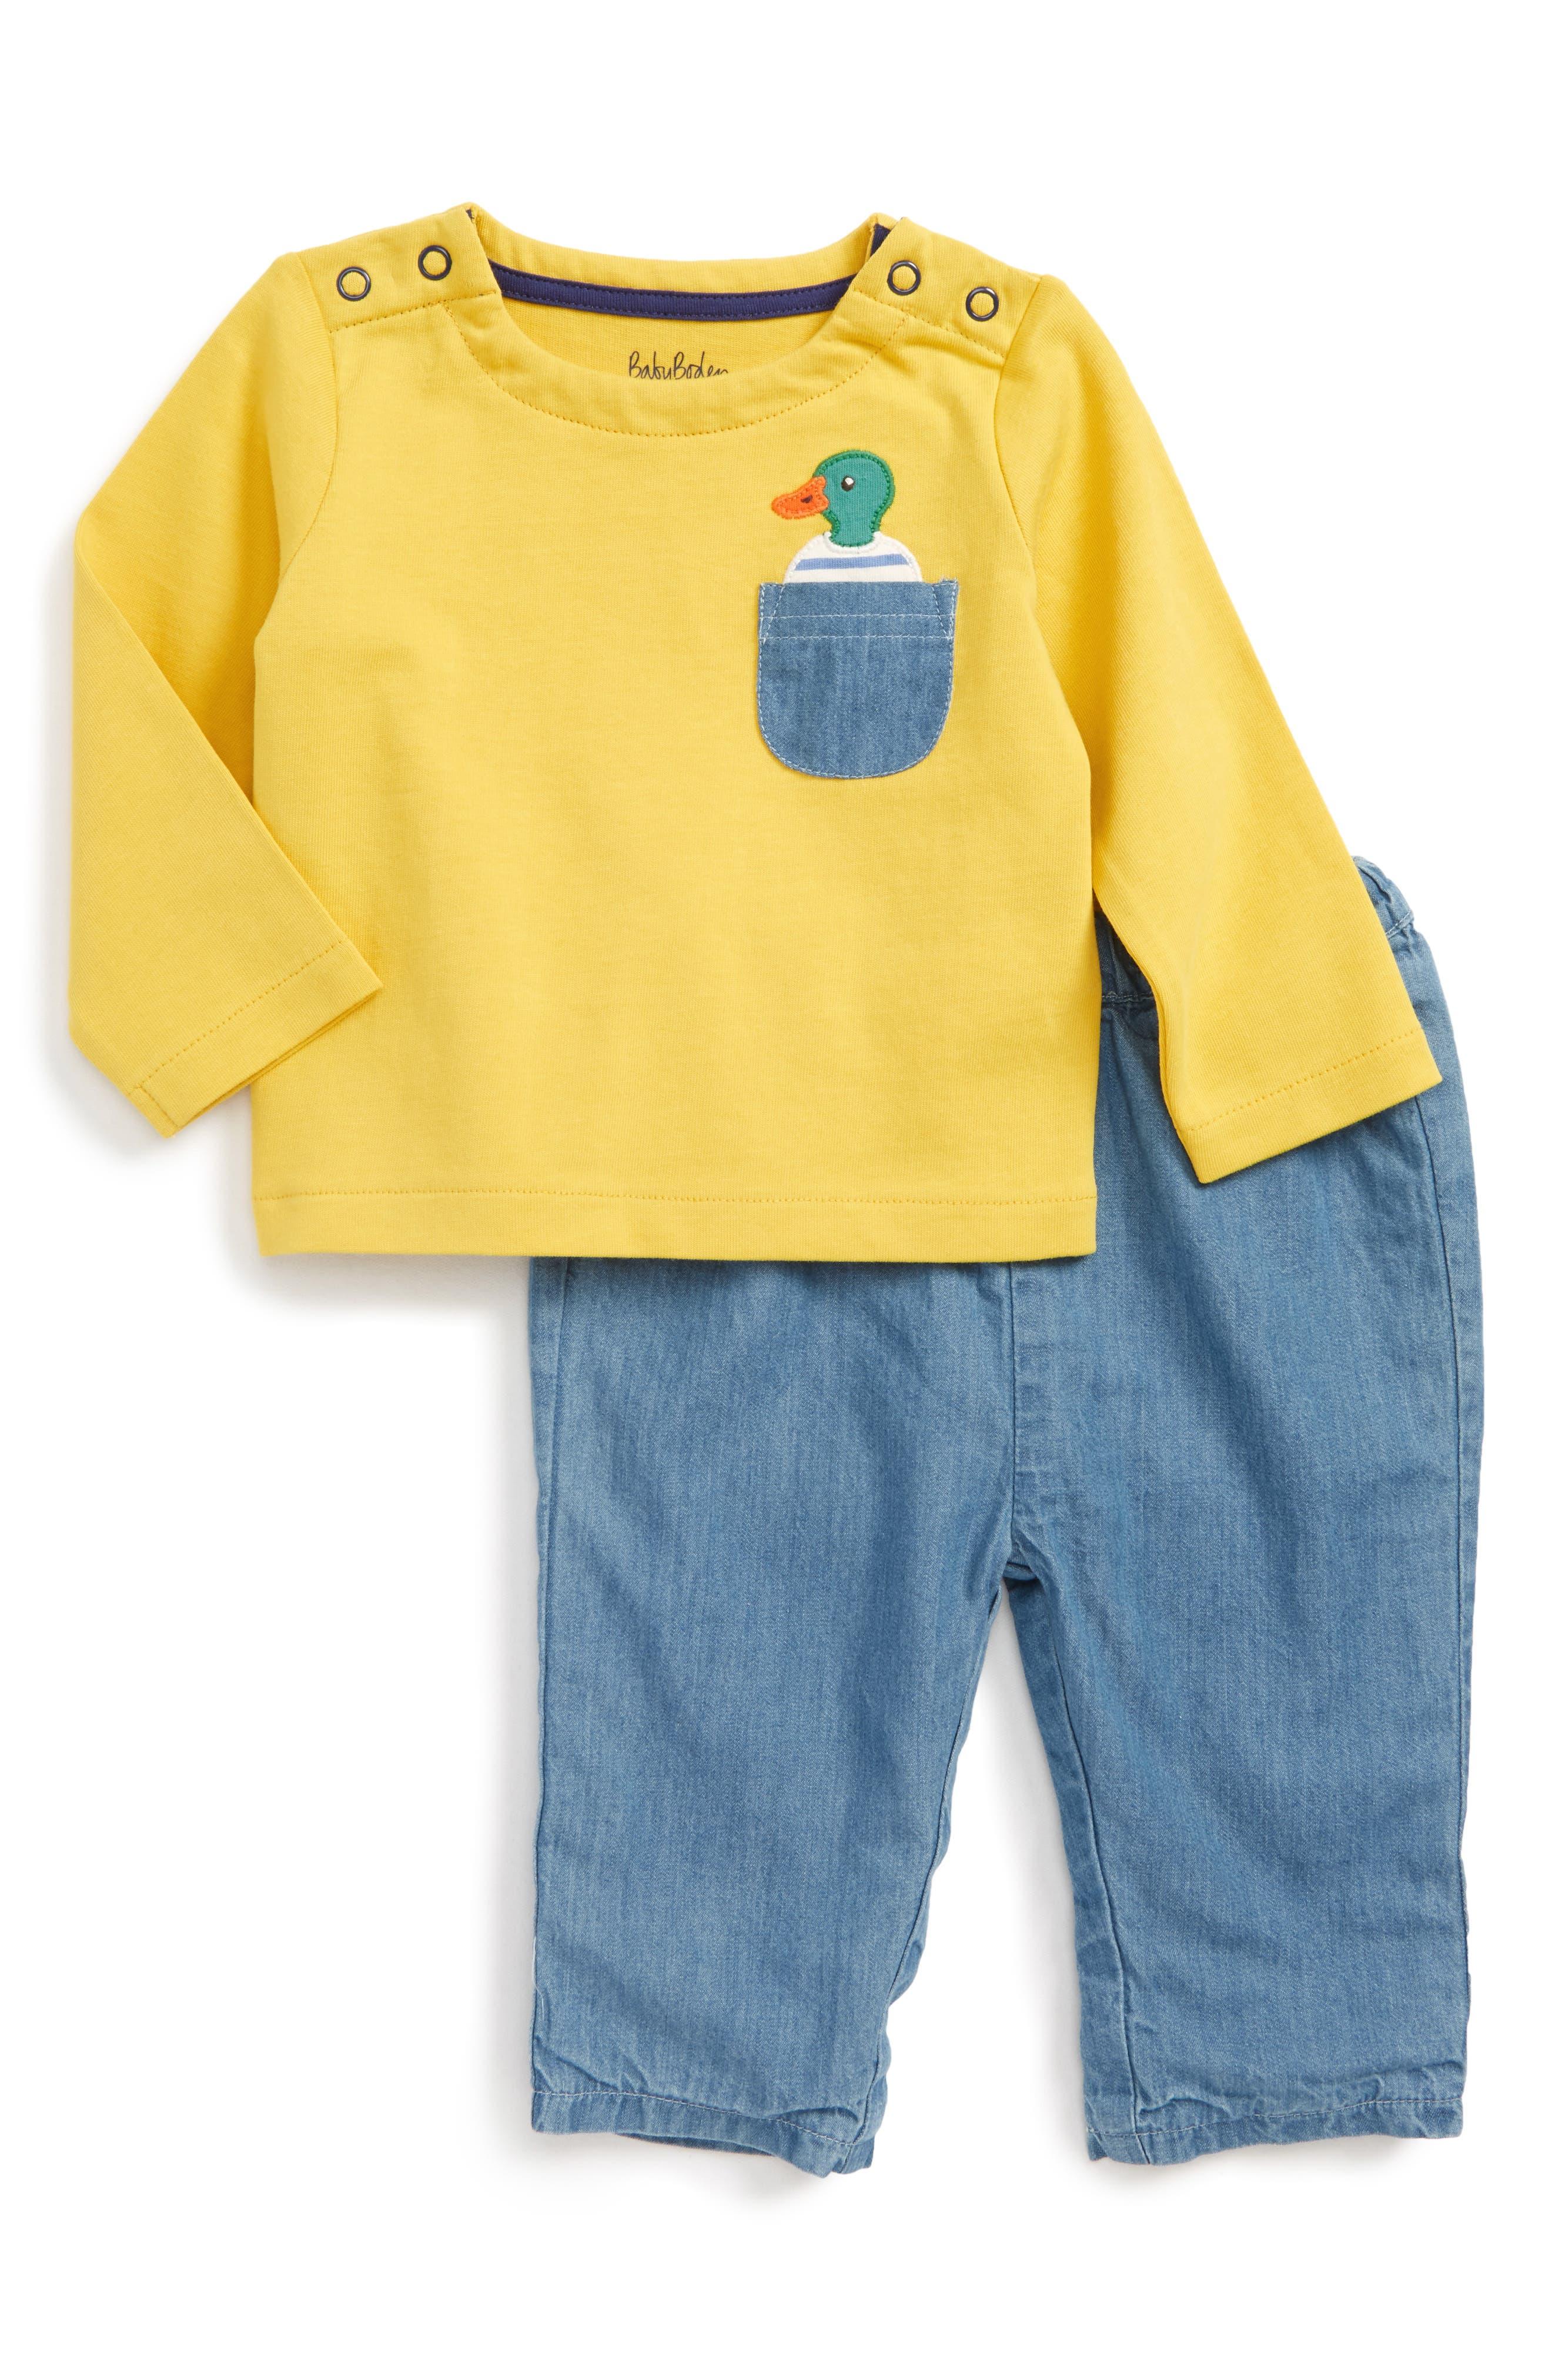 Pocket Pet Play Set,                         Main,                         color, Sweetcorn Yellow Duck